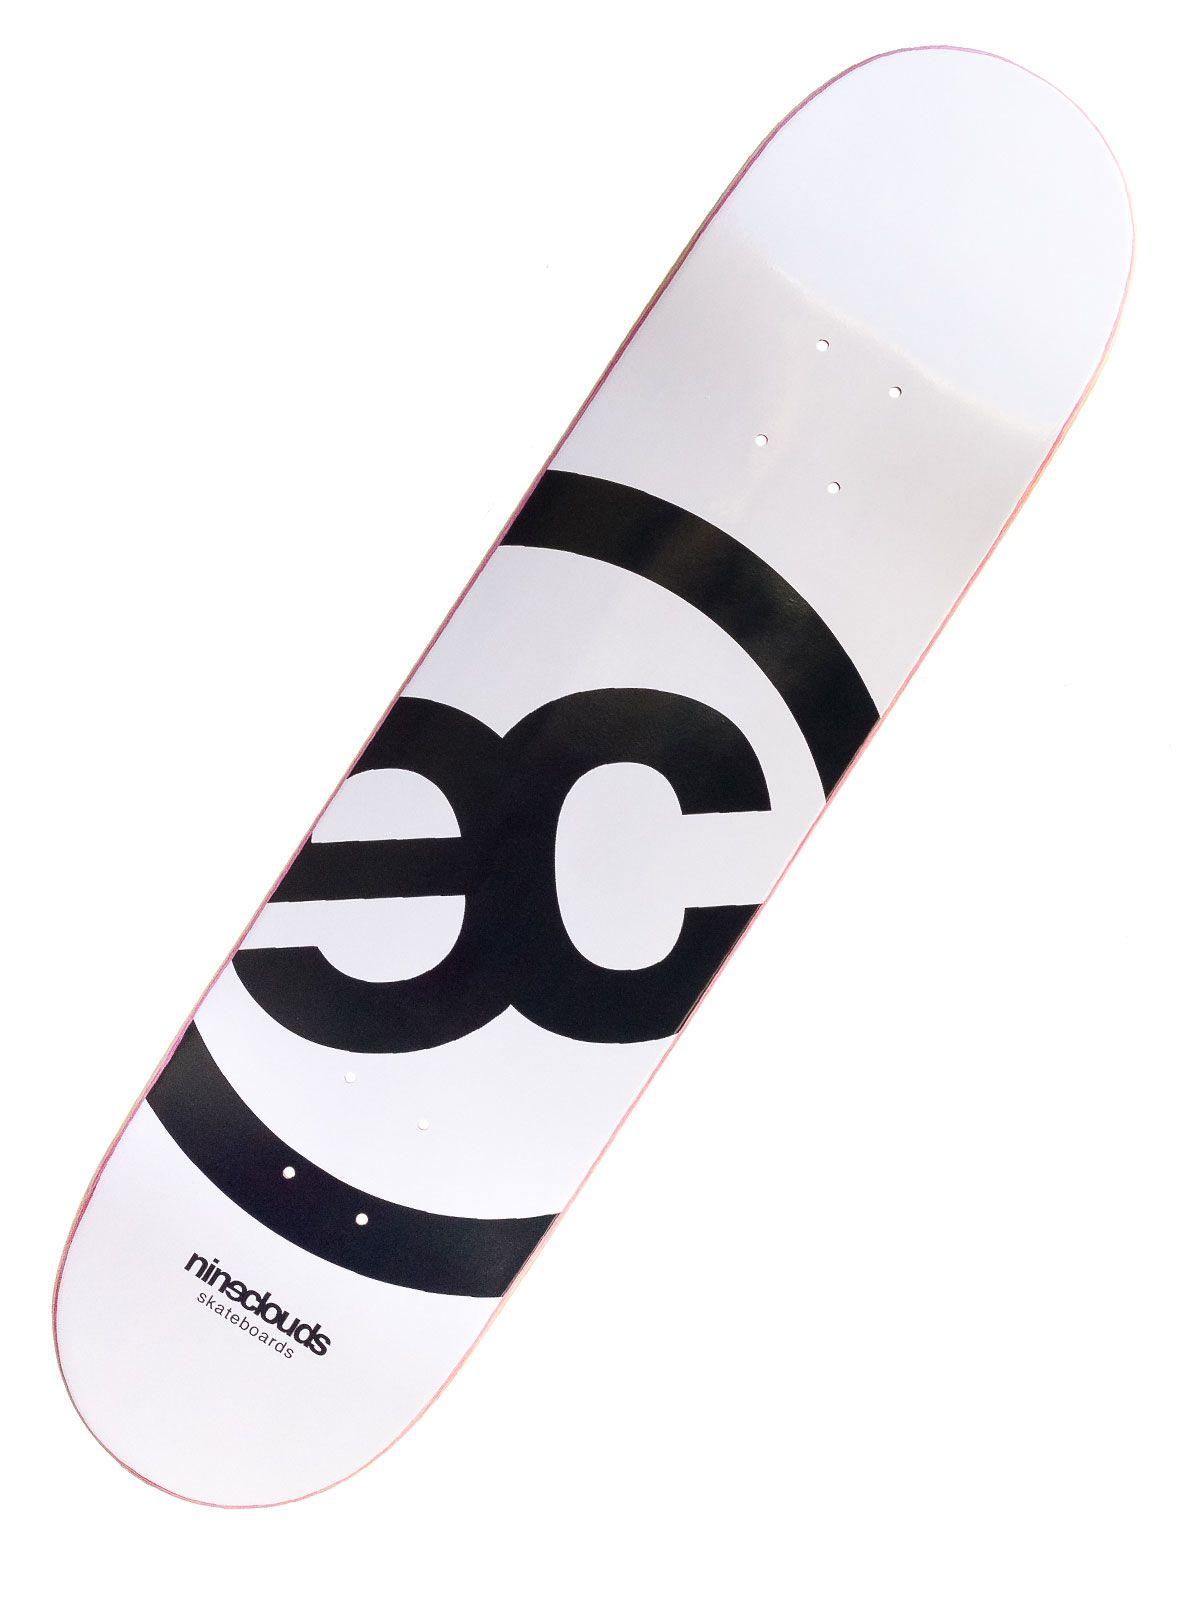 shape-nineclouds-logo-moeda-branco-85-1-image